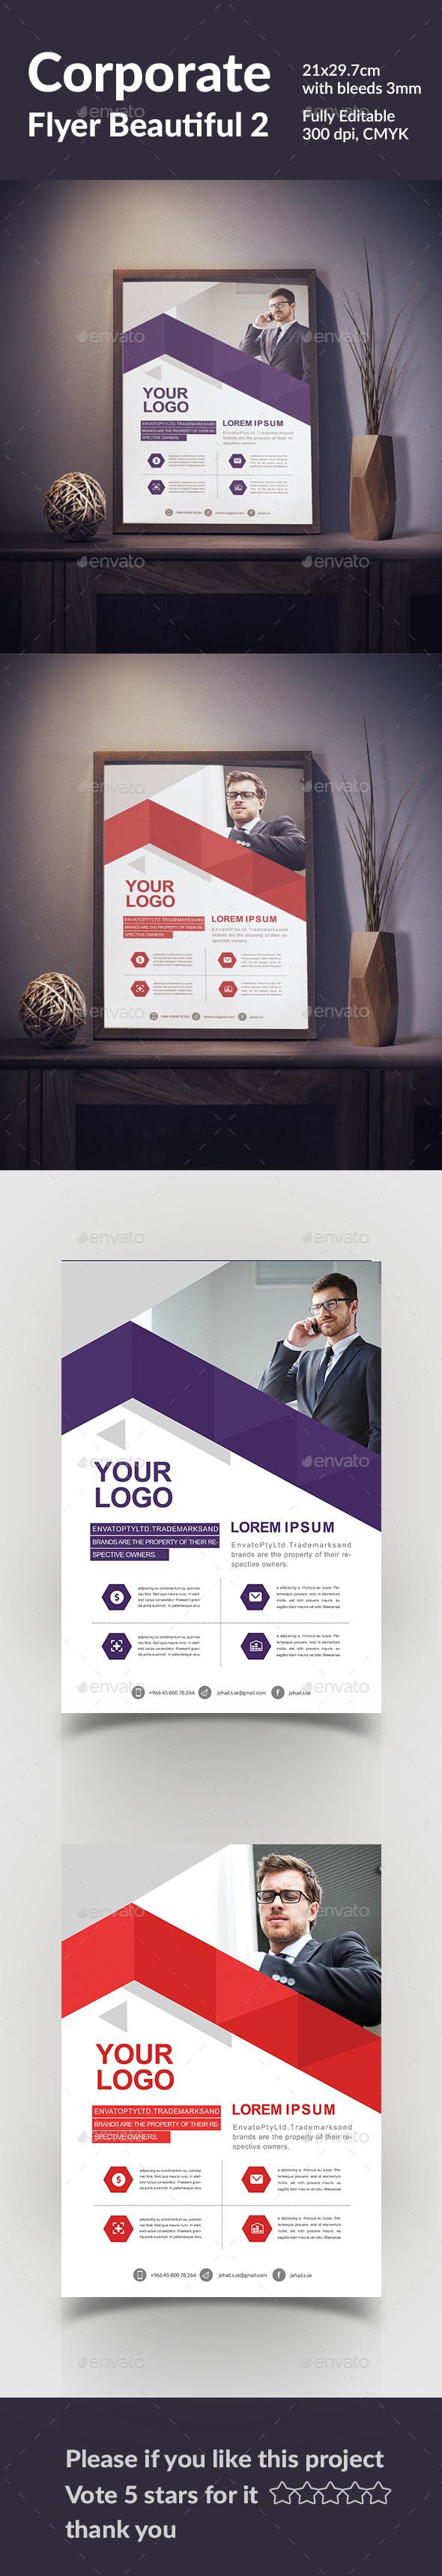 Corporate Flyer Beautiful 2 - Flyers Print Templates